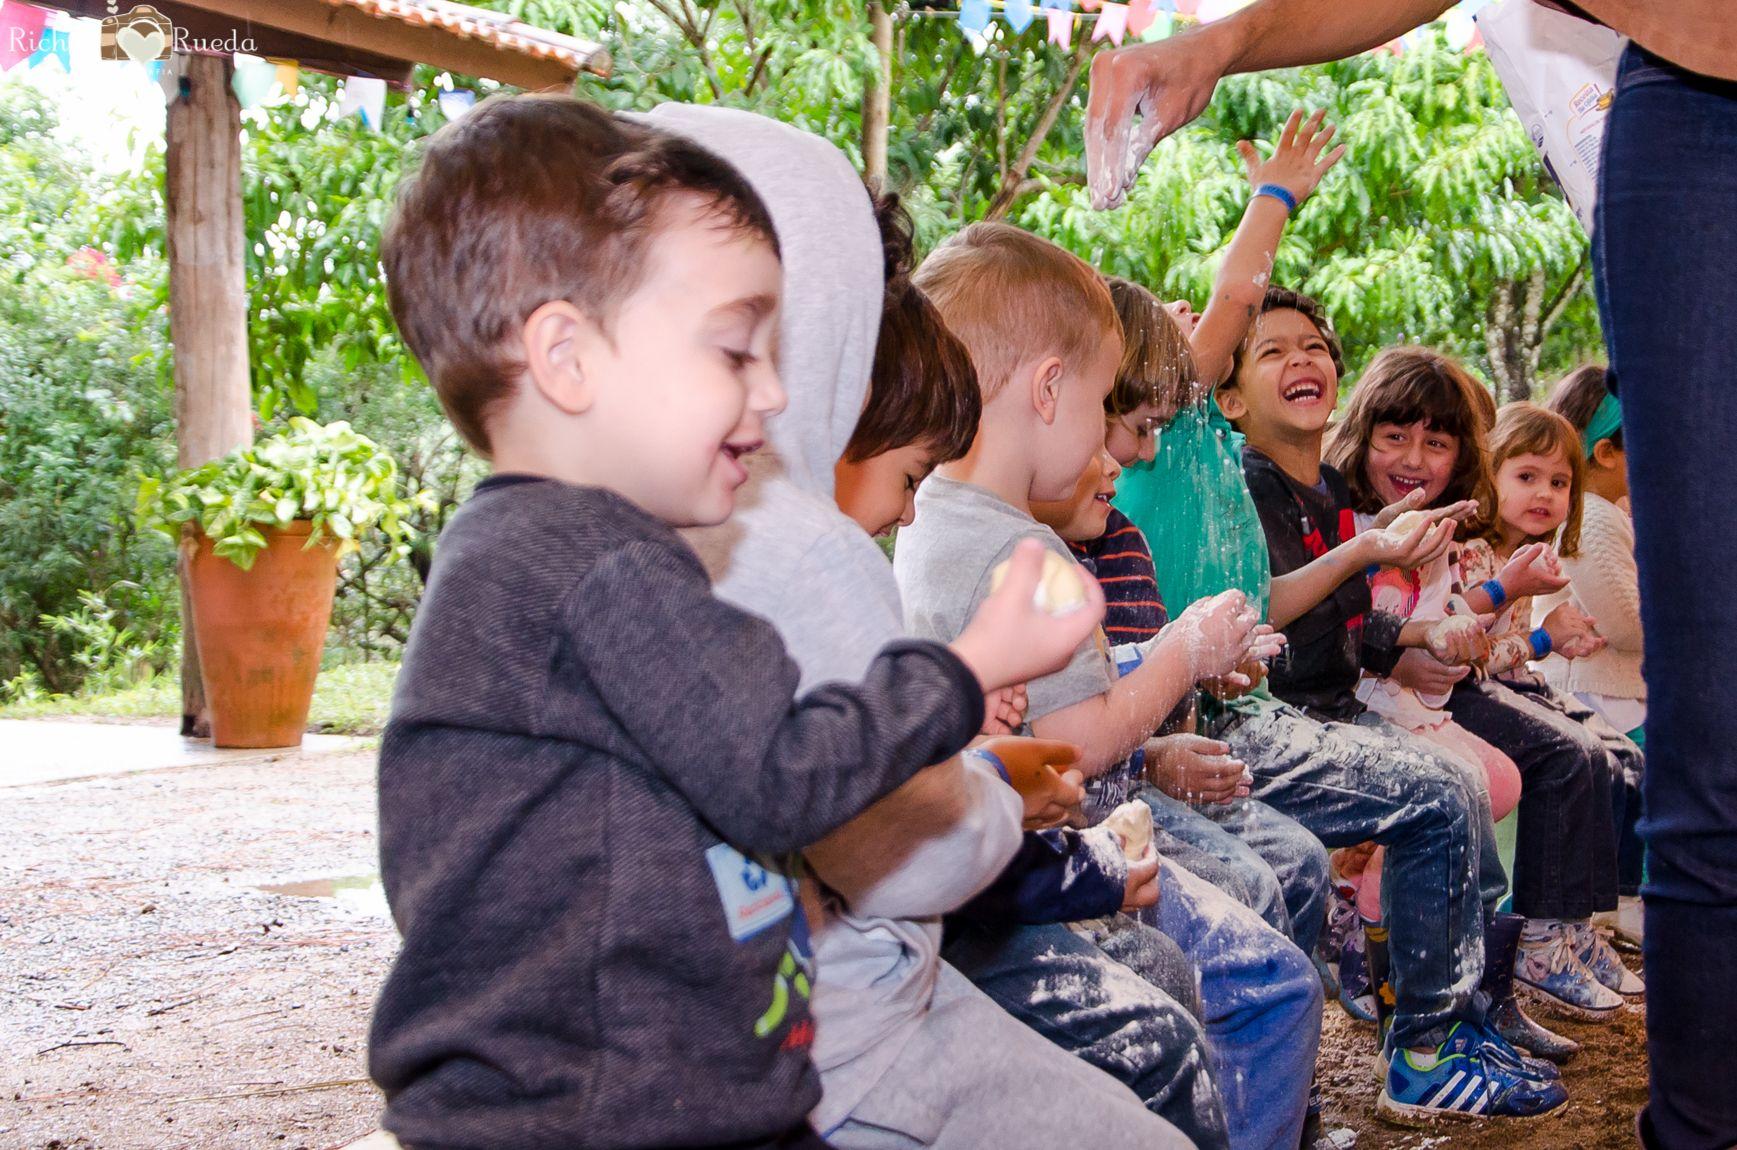 Fotografia infantil, Fotografia festa infantil, Fotógrafa de festa infantil.